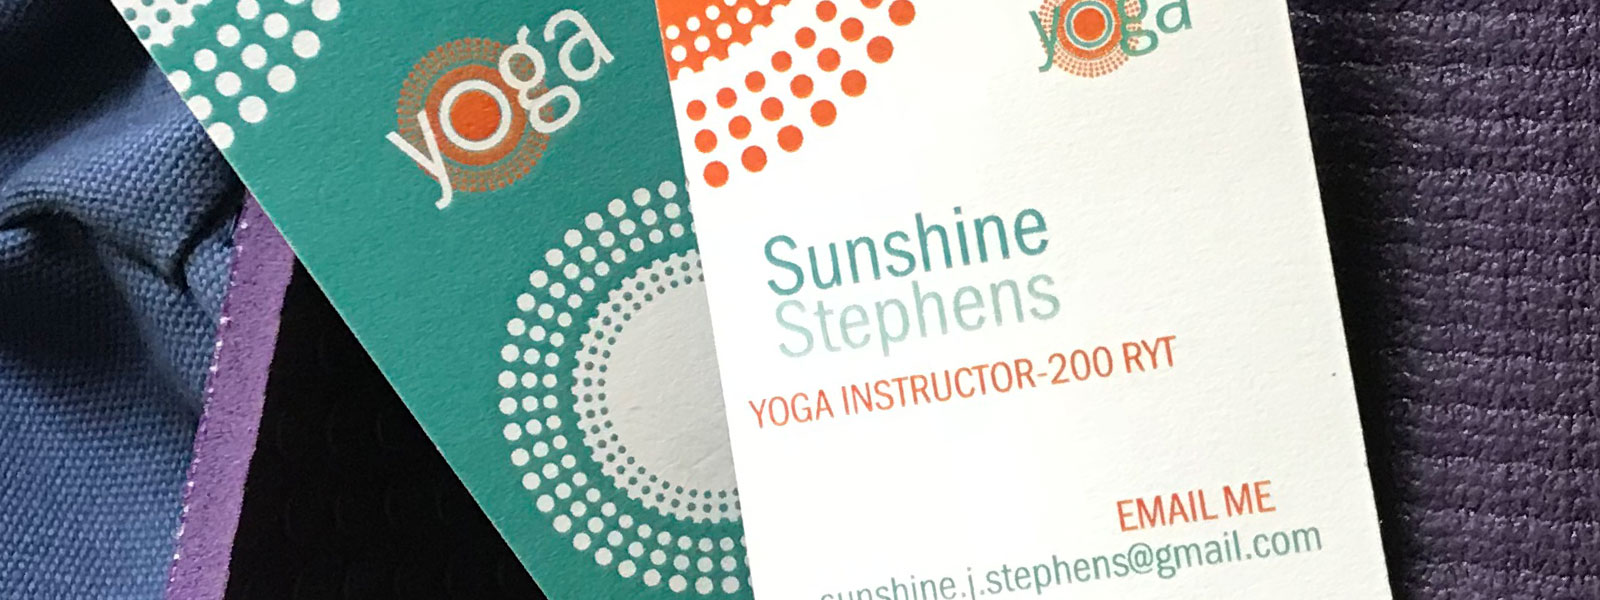 Sunshine Stephens Yoga